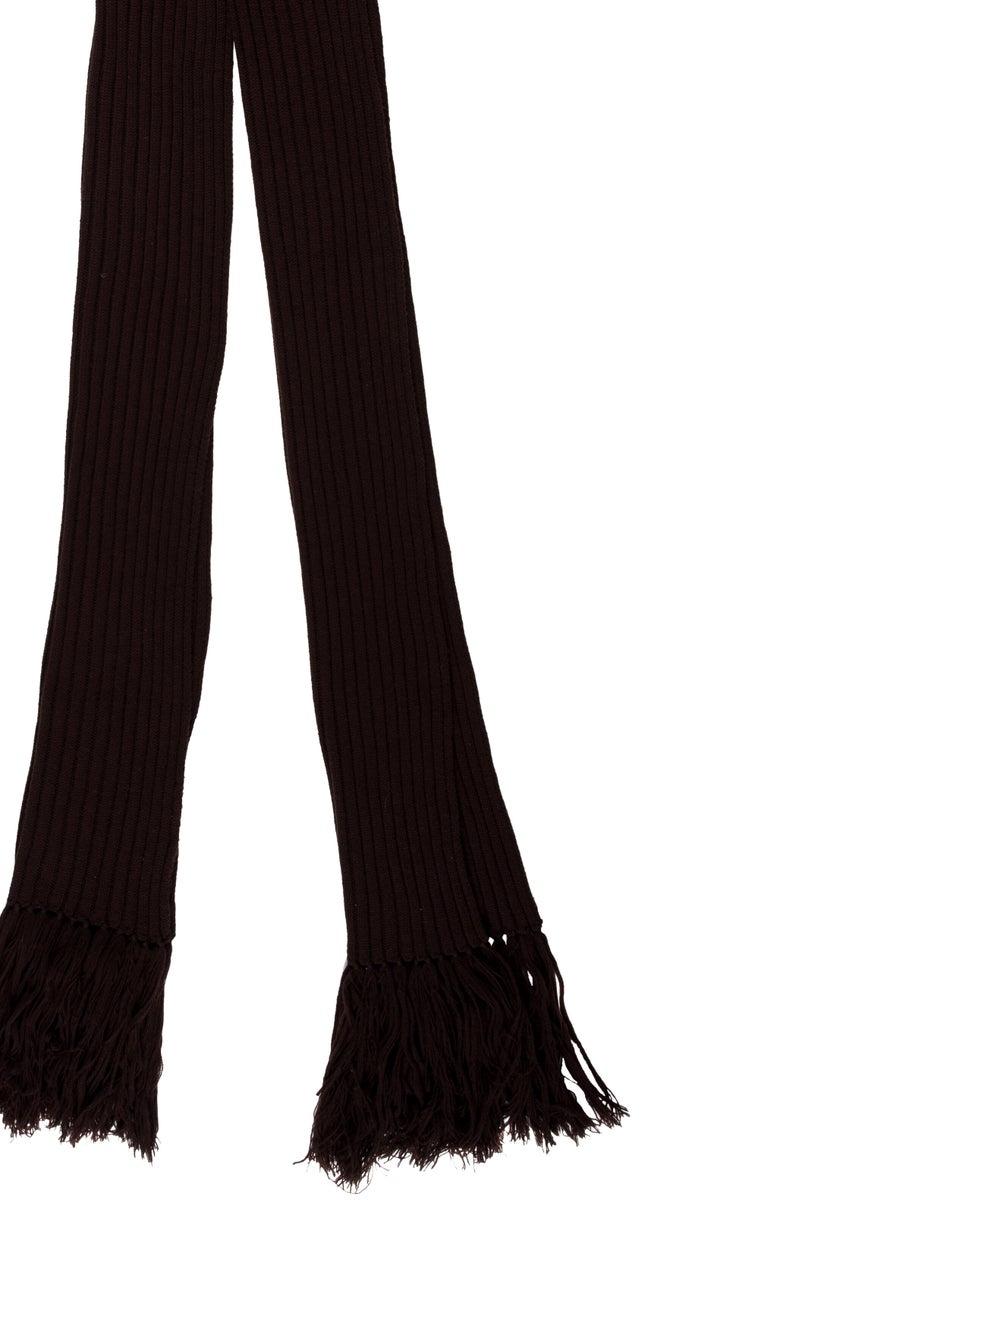 Dolce & Gabbana Knit Fringe Scarf Brown - image 2